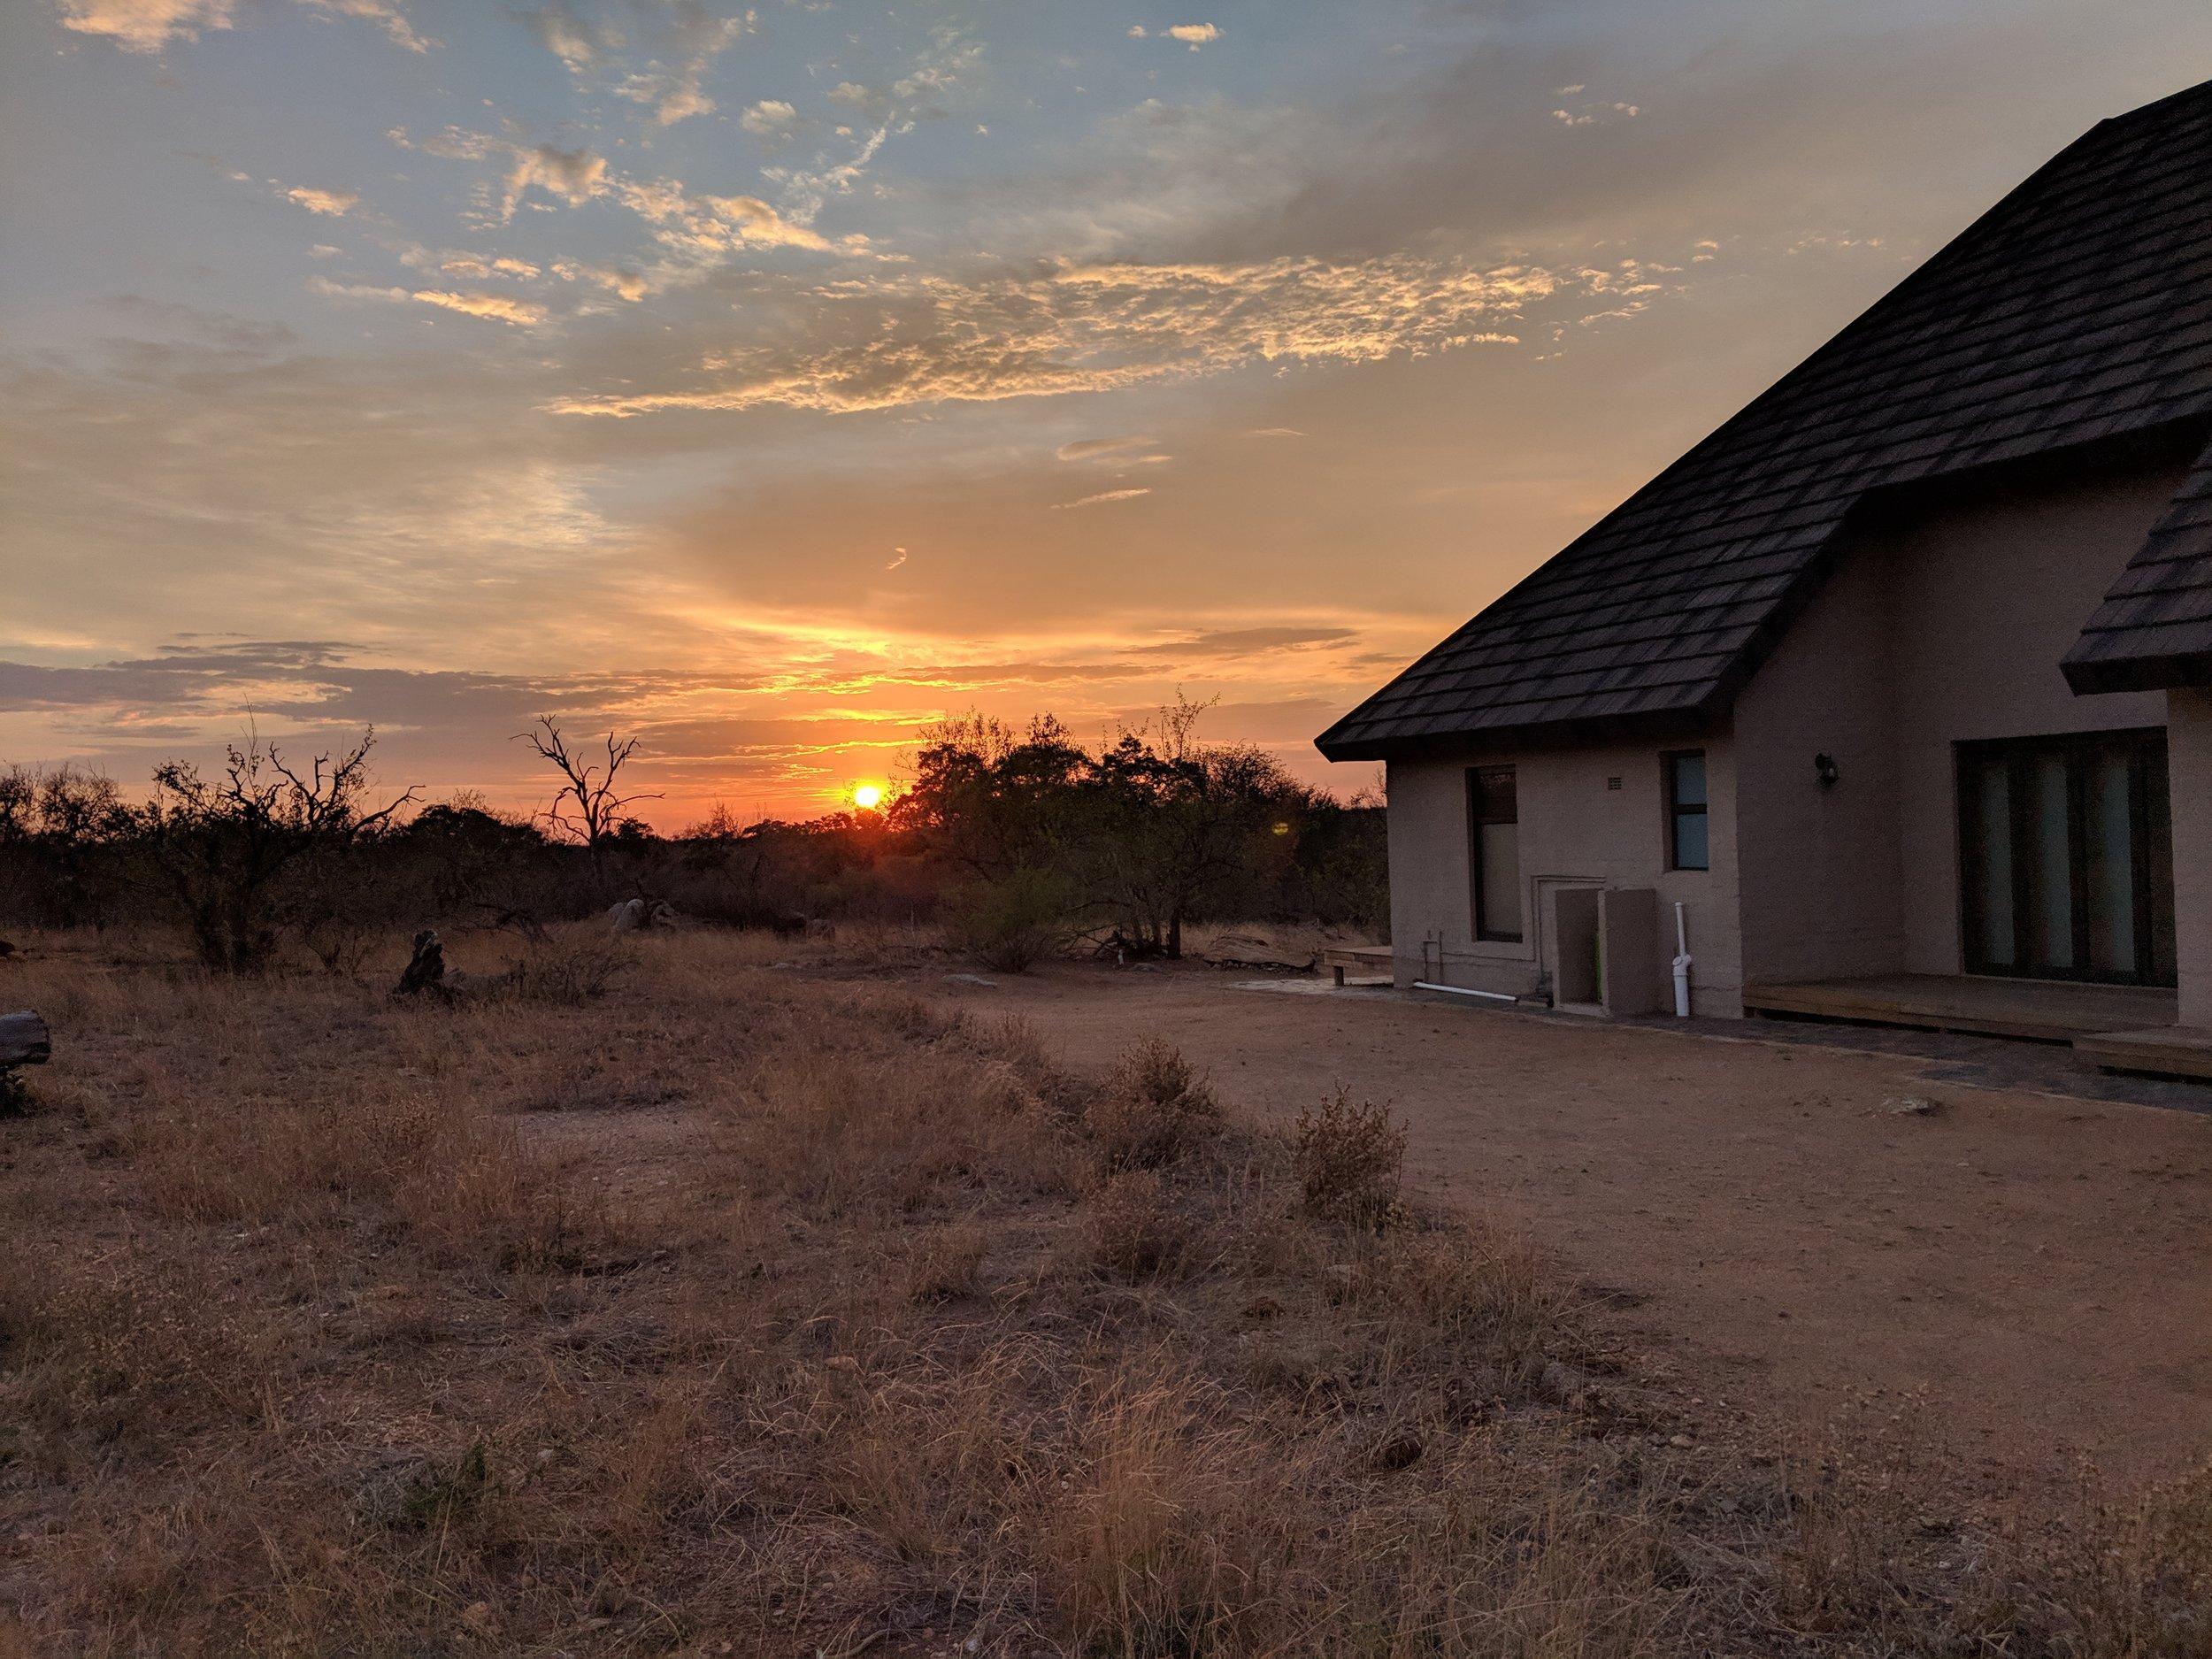 Sunset at a safari private lodge. safari planner